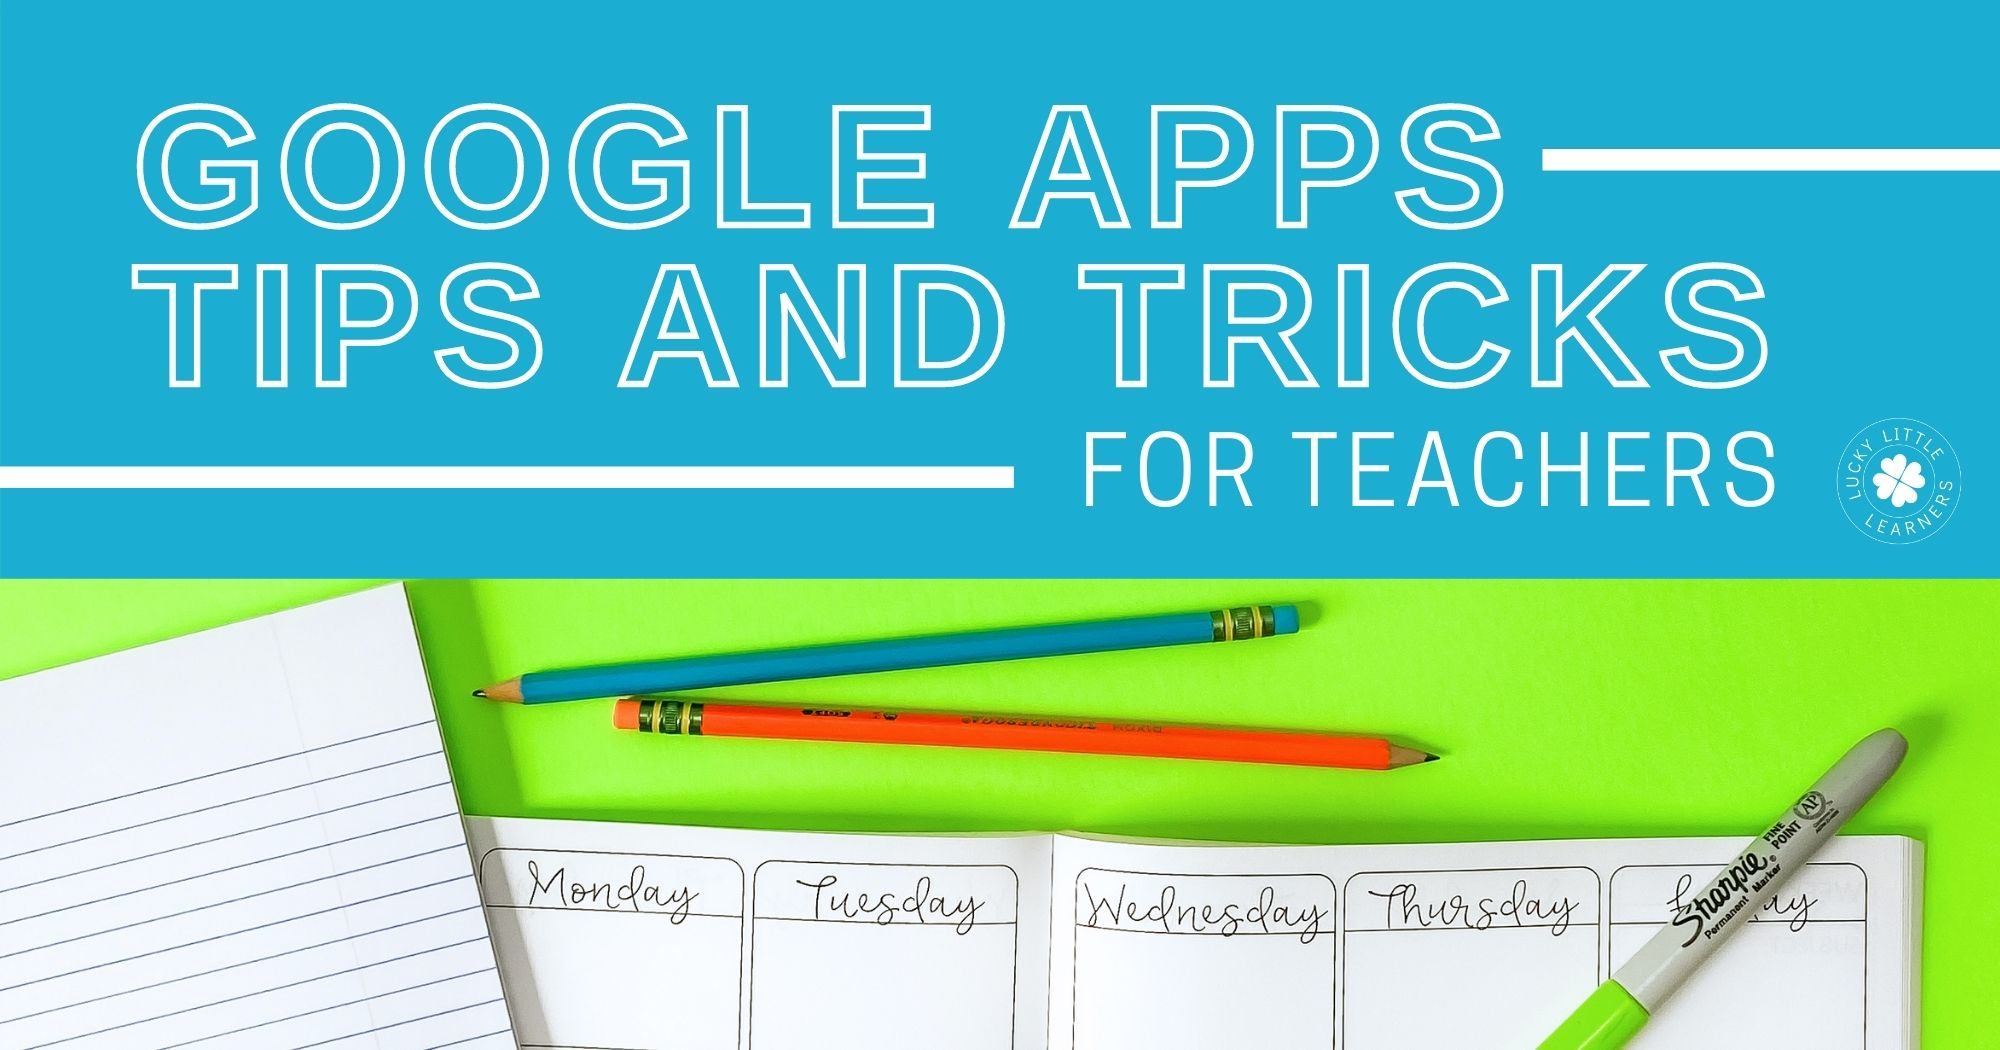 Google Apps Tips and Tricks for Teachers